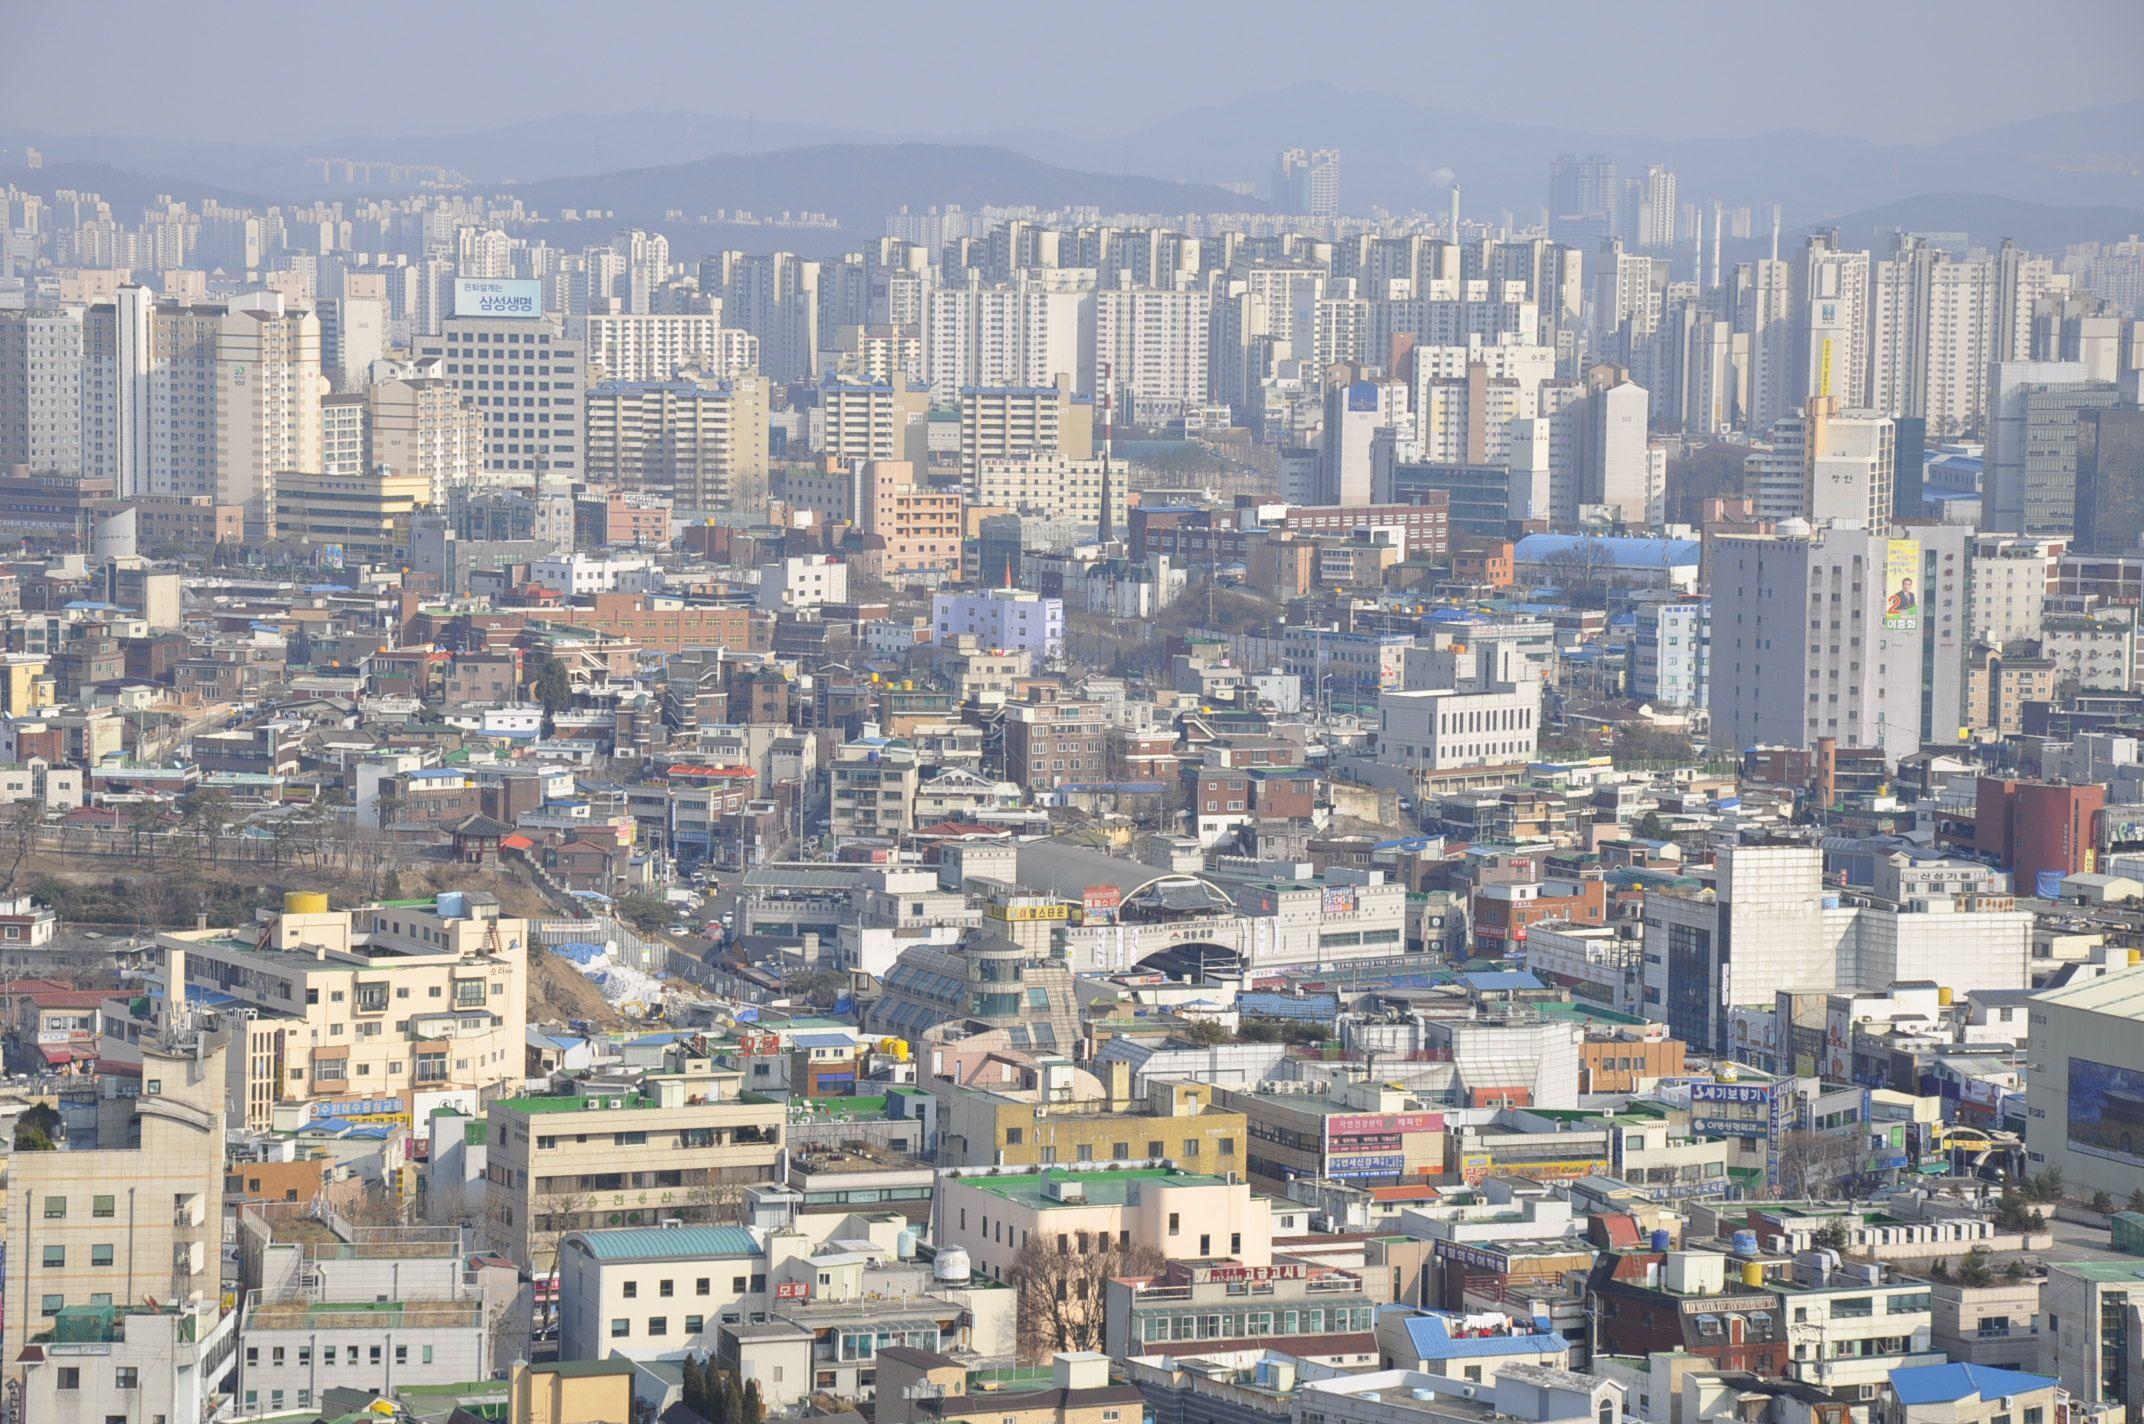 Suwon, South Korea  #그대로에집엄마를  #네트워크마케팅 #다단계마케팅 #피부관리 #ClassyLadyEntrepreneur    www.RadiantFitAndHappy.com  ⭐️⭐️ www.SkincareInKorea.info